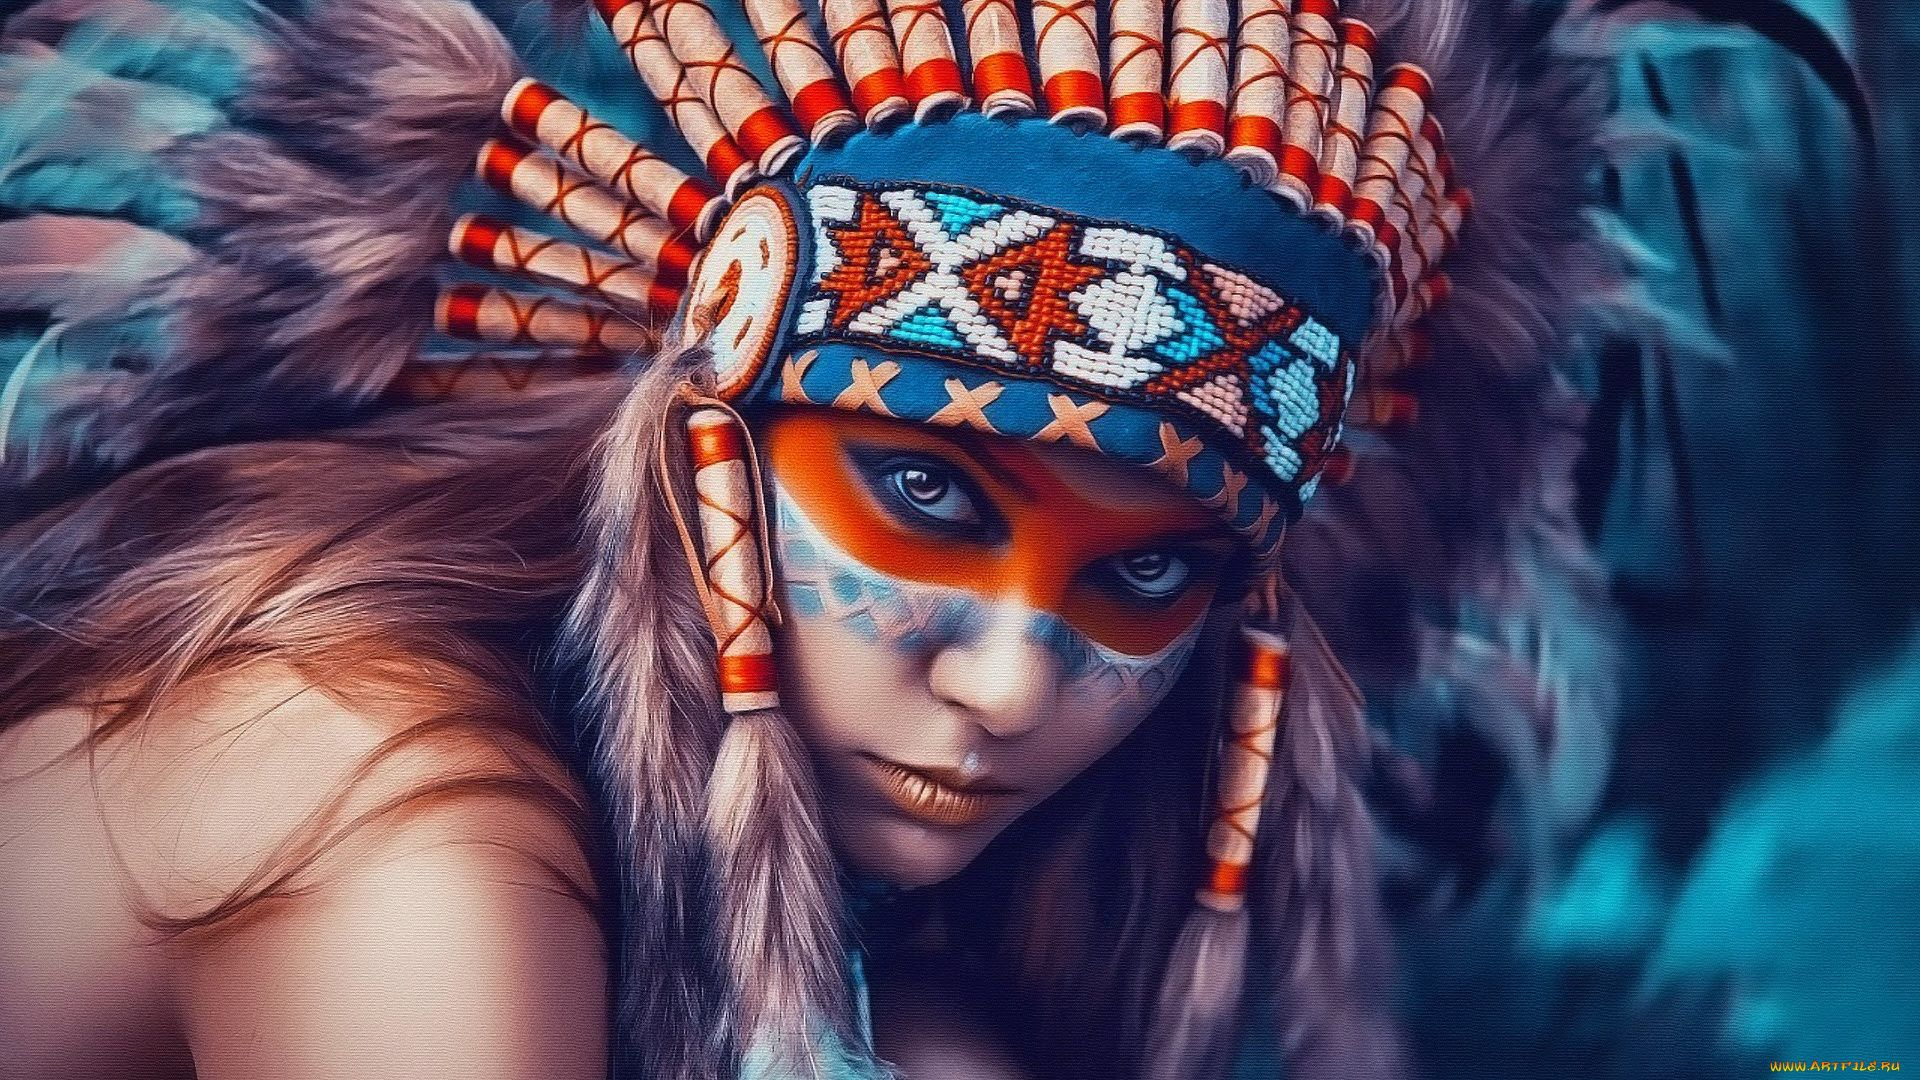 Girl In Indian Headdress